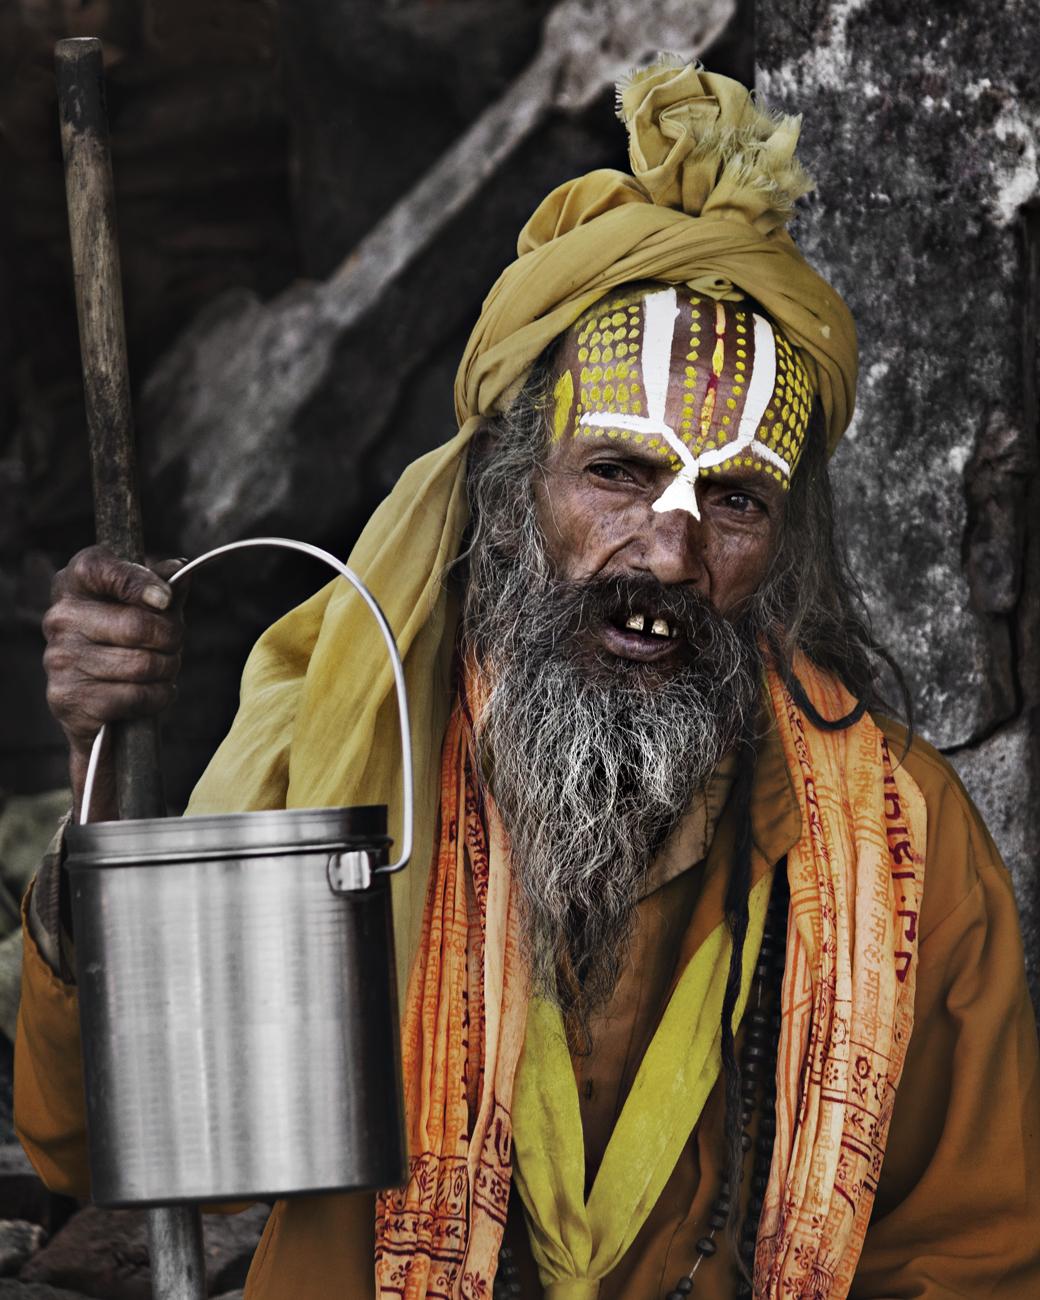 Retrato de Sadhu en Pashupatinat (Katmandu, Nepal - 2015) - Sadhu Portrait, Pashupatinat (Kathmandu, Nepal - 2015) - Visage   Travel Portraits Collection   Dani Vottero